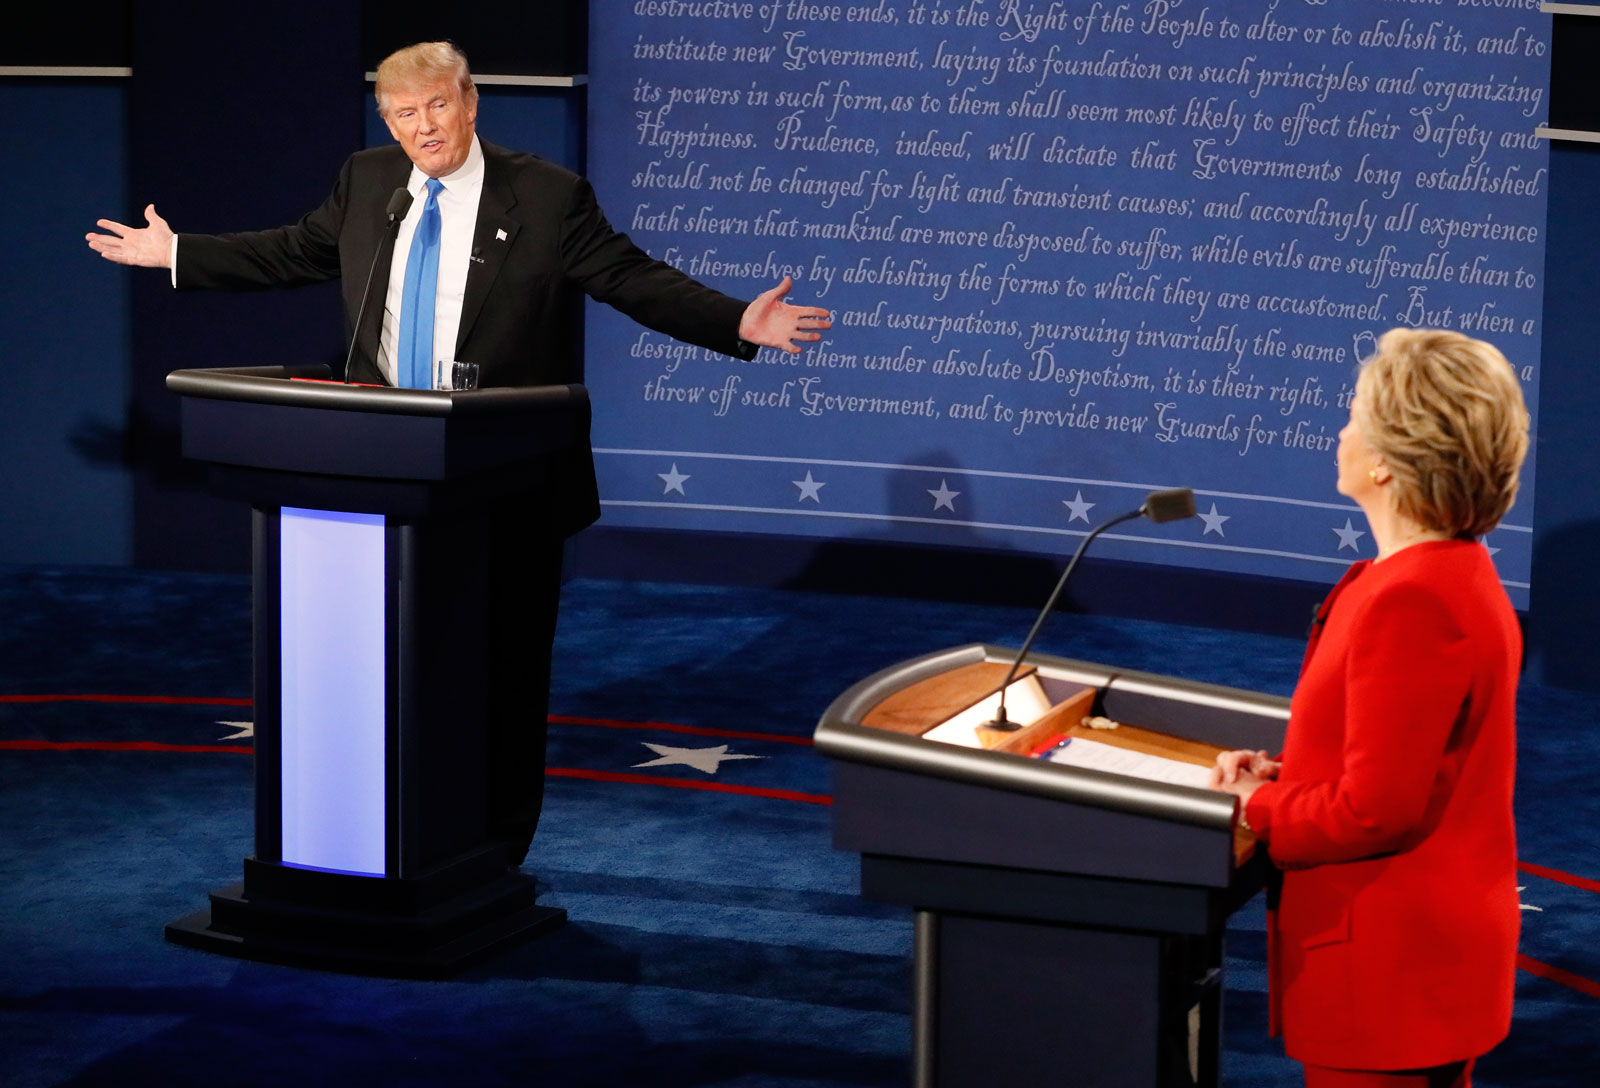 Donald Trump and Hillary Clinton during the debate at Hofstra University, Hempstead, New York, September 26, 2016